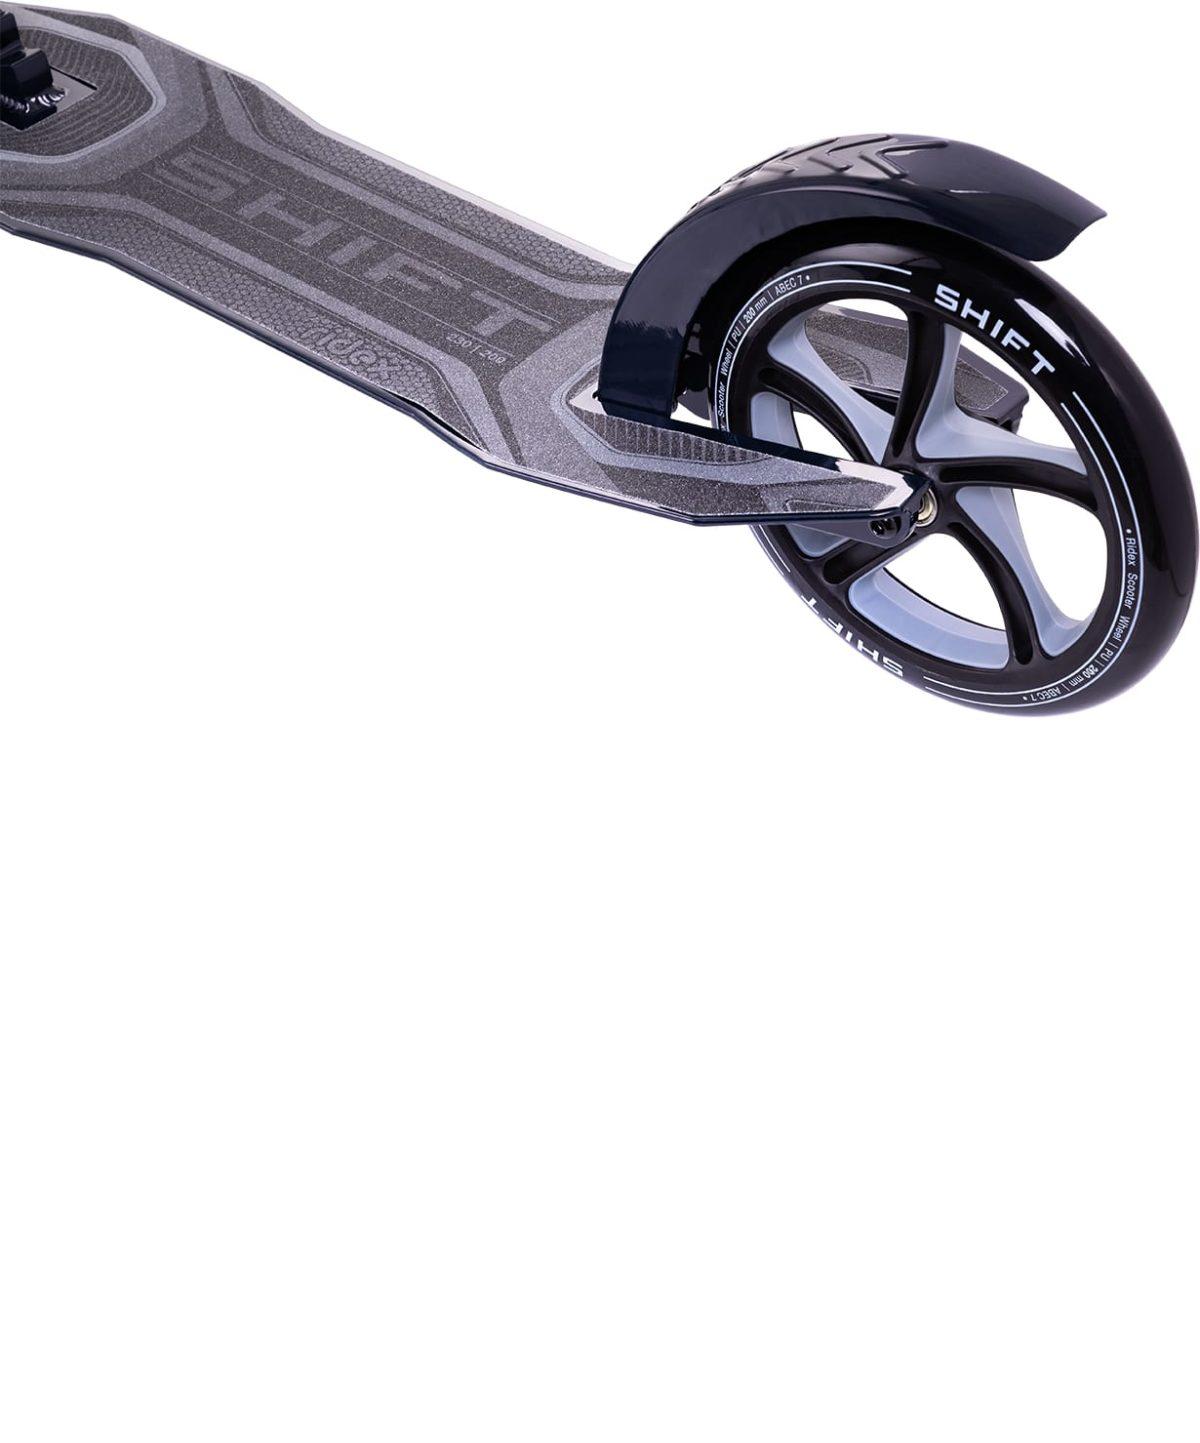 RIDEX Shift Самокат 2-колесный 230/200 мм  Shift: серый - 5